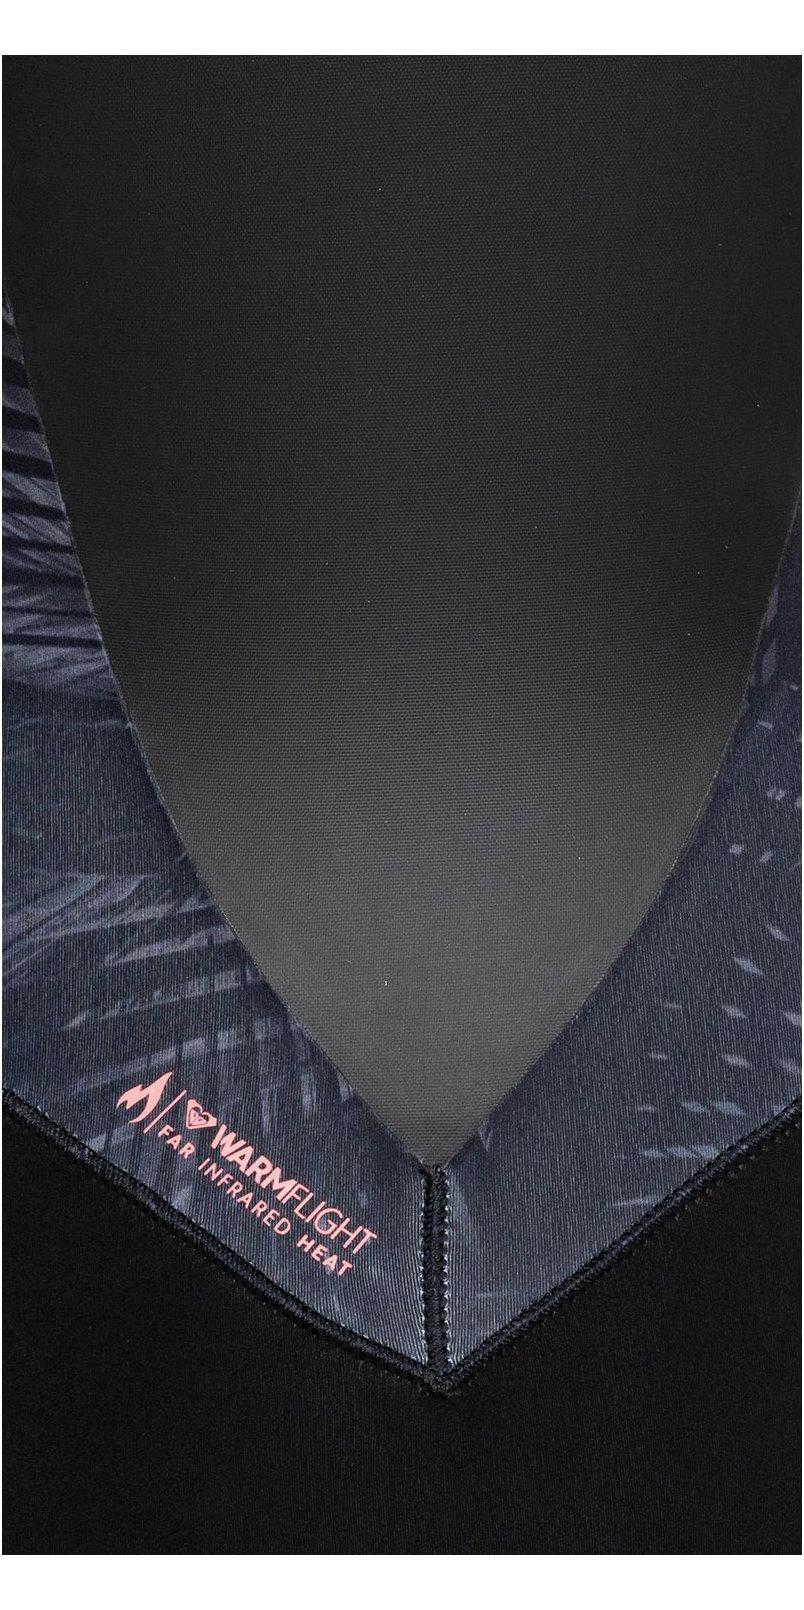 2019 Roxy Frauen Syncro 4/3mm Chest Zip Anzug Schwarz / Rotguss Erjw103022